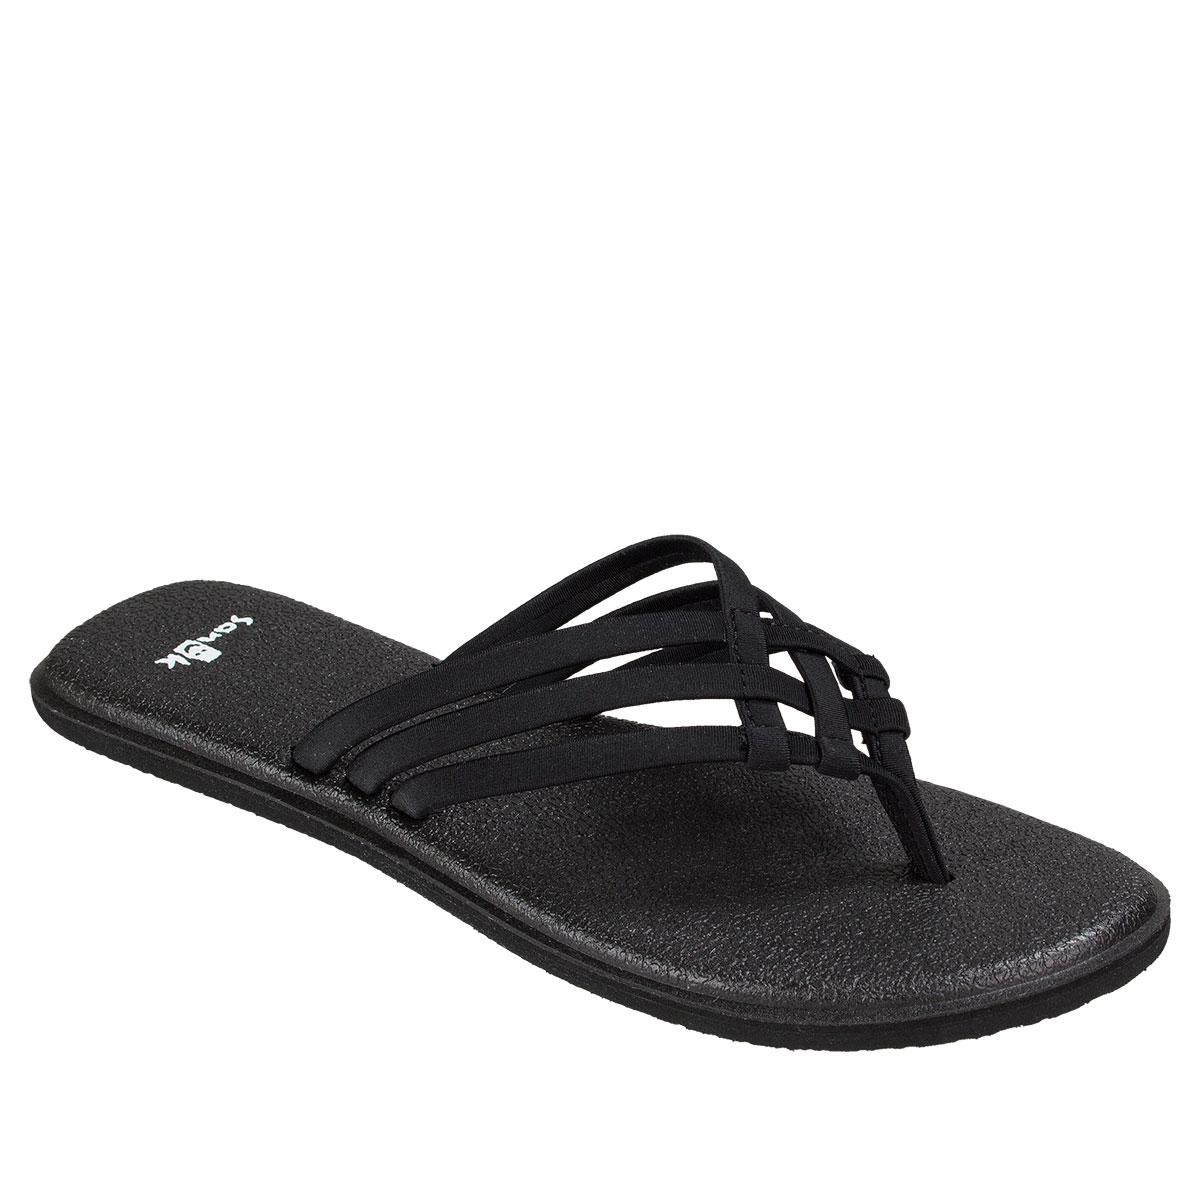 2052ae6362ff2e Image is loading Sanuk-Yoga-Salty-Women-039-s-Sandals-Black-